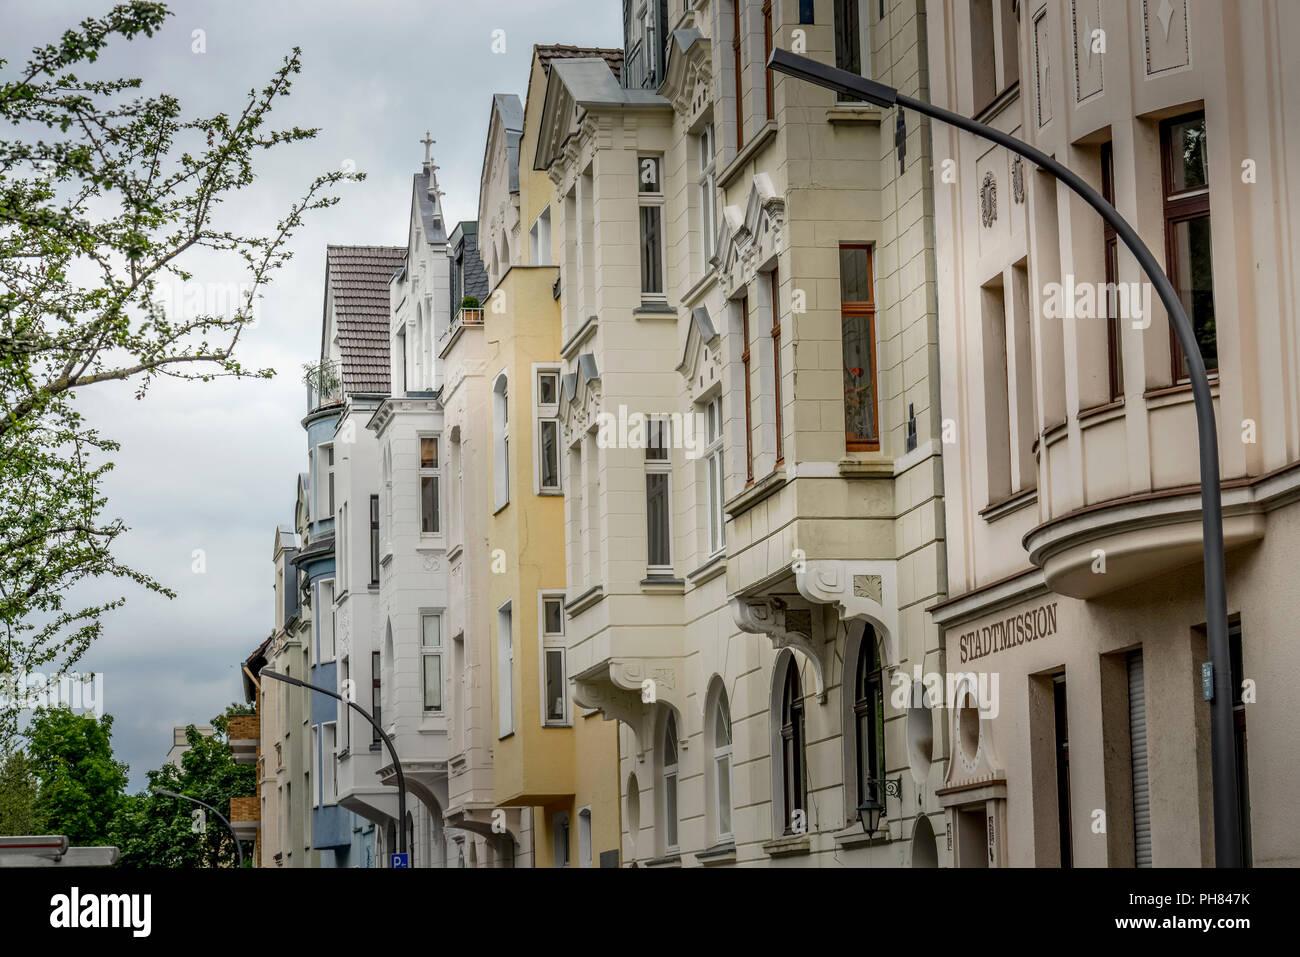 Altbauten, Erzbergerplatz, Nippes, Koeln, Nordrhein-Westfalen, Deutschland Stock Photo